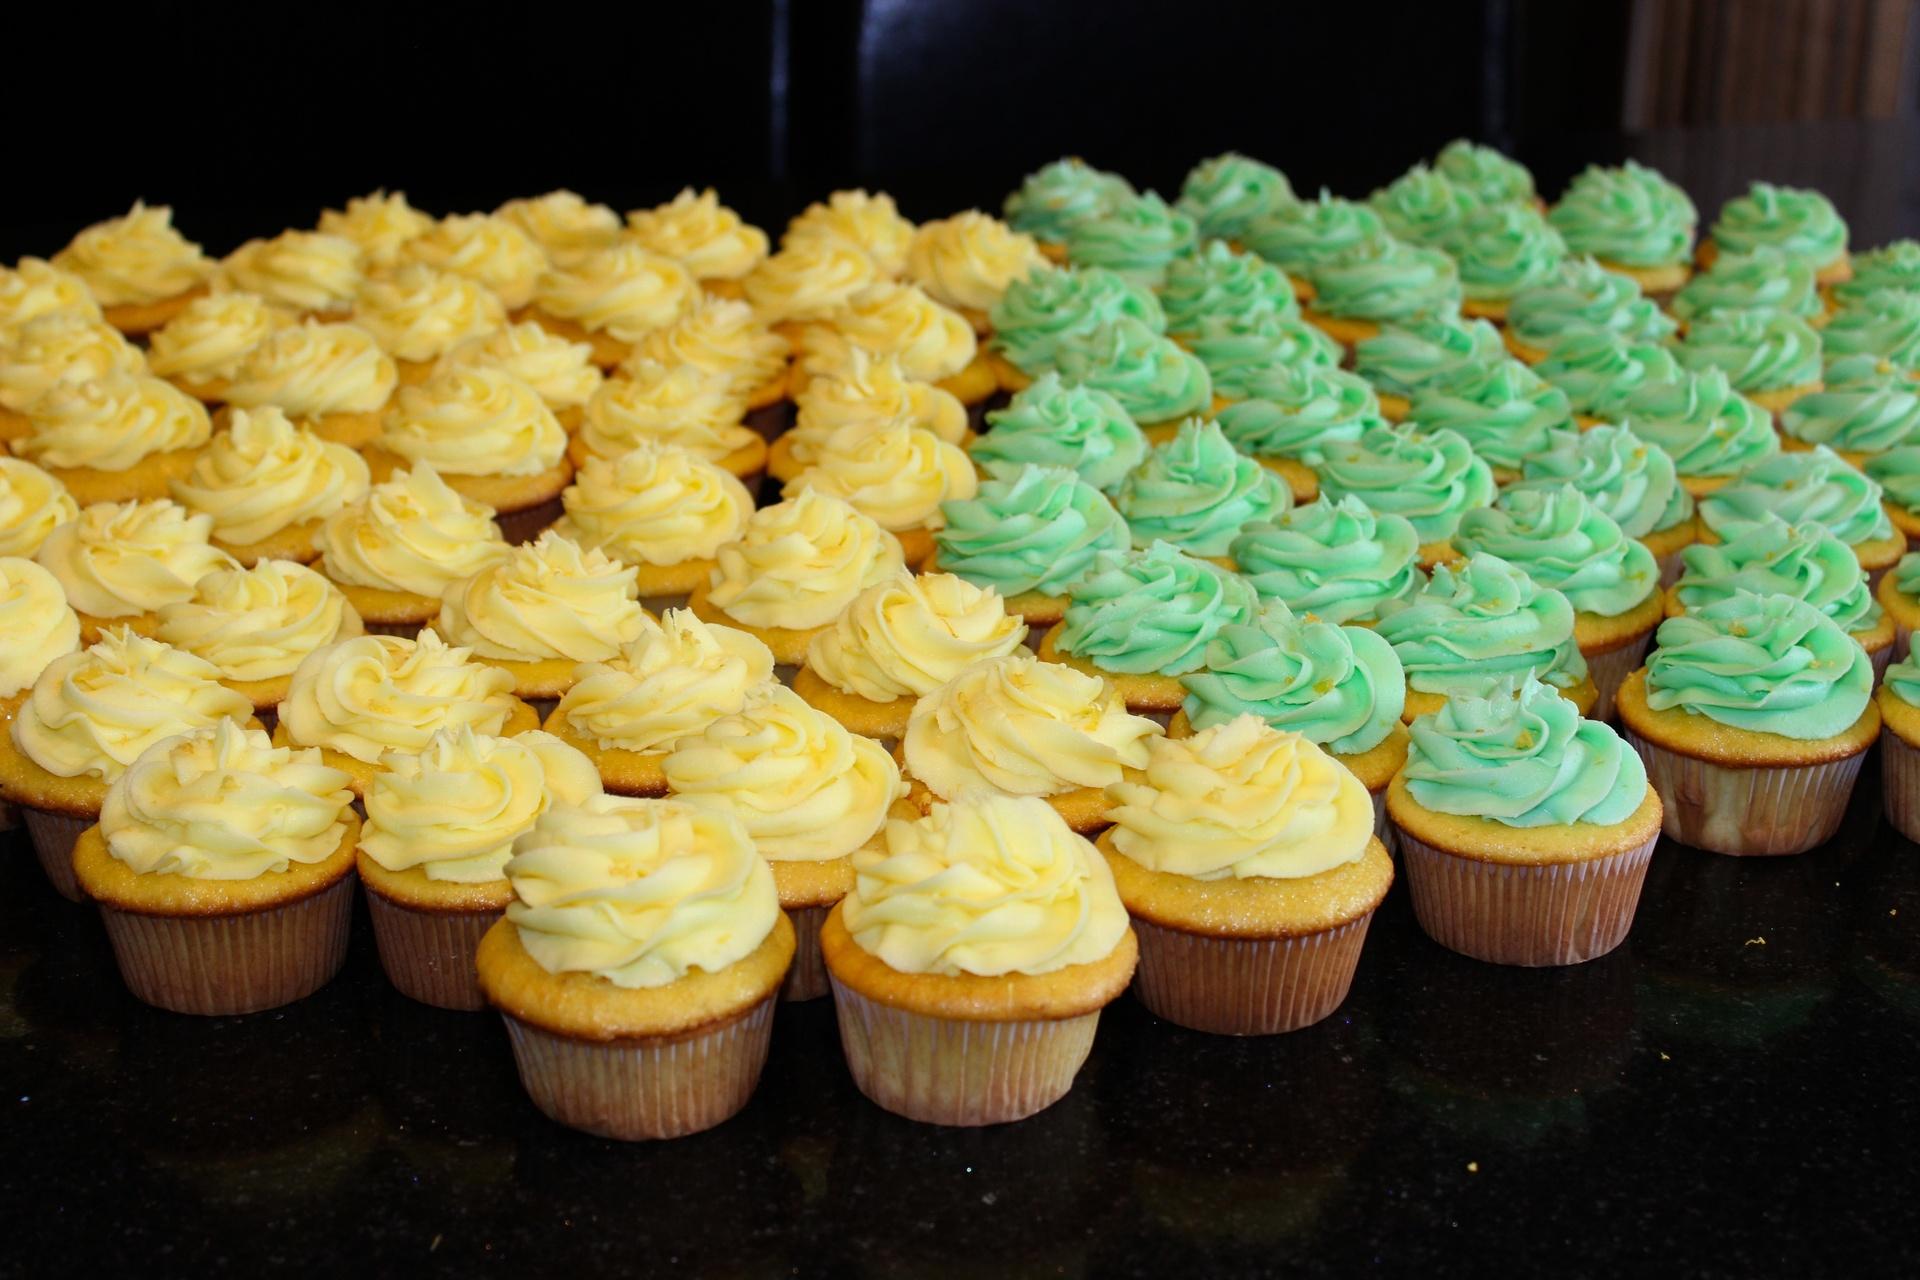 University of Guelph Go Green Celebration Cupcakes